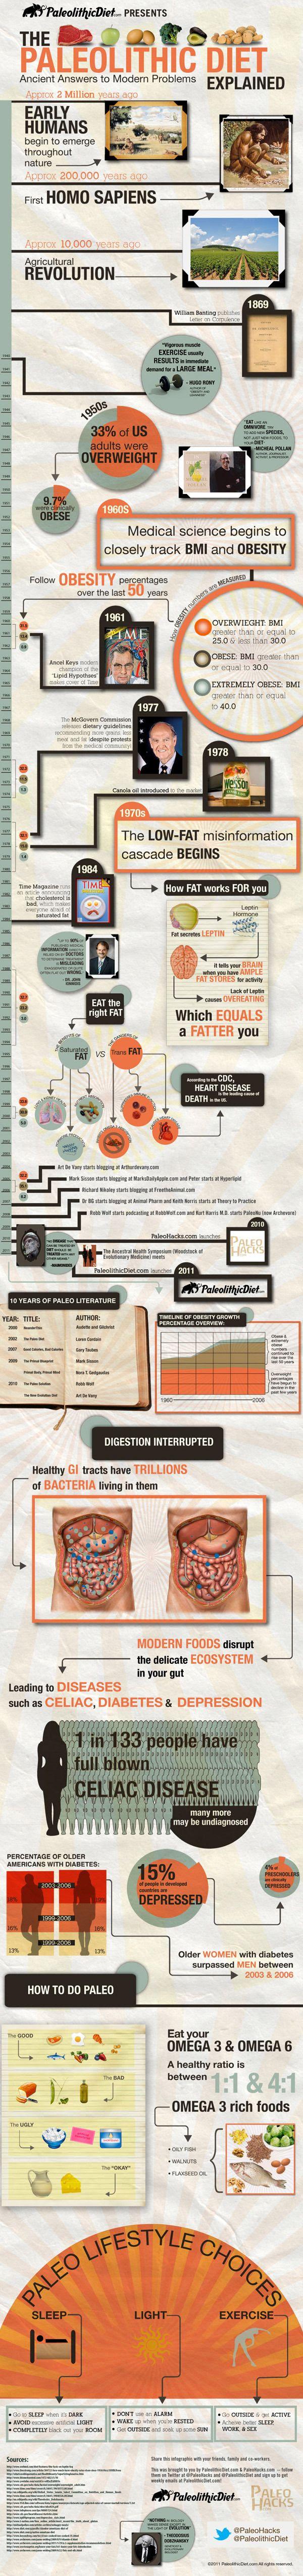 The Paleo Diet Infographic!